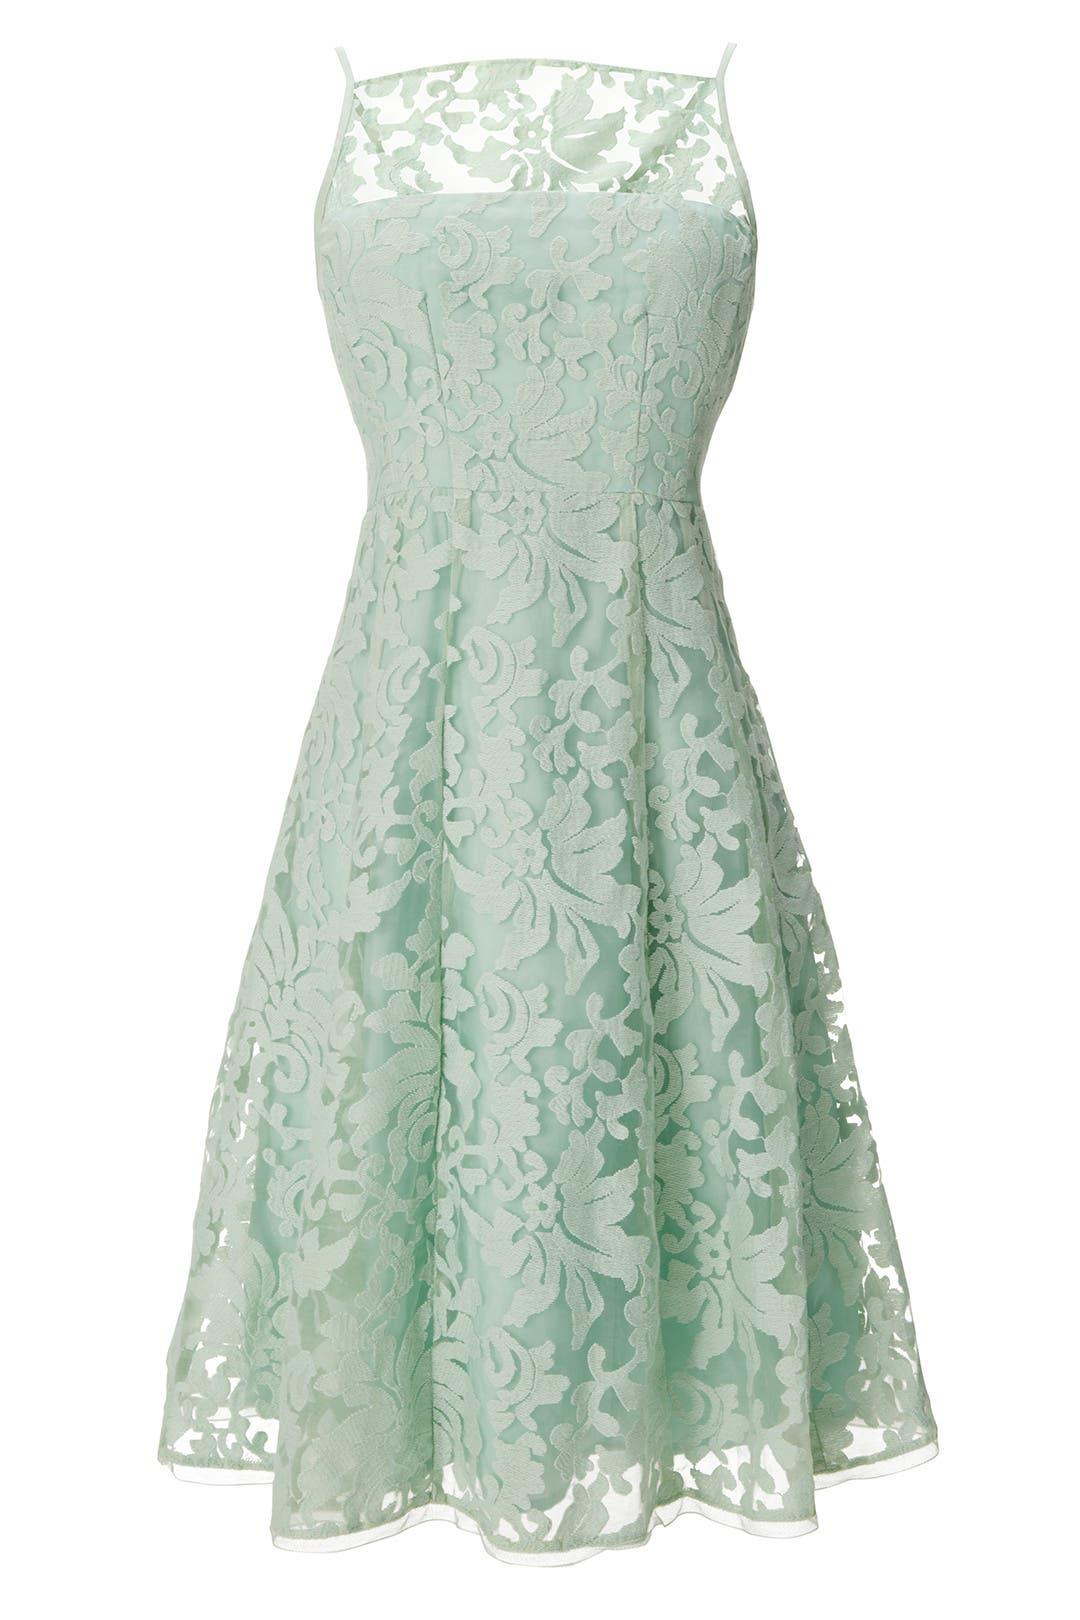 Spearmint Alina Dress by Nanette Lepore